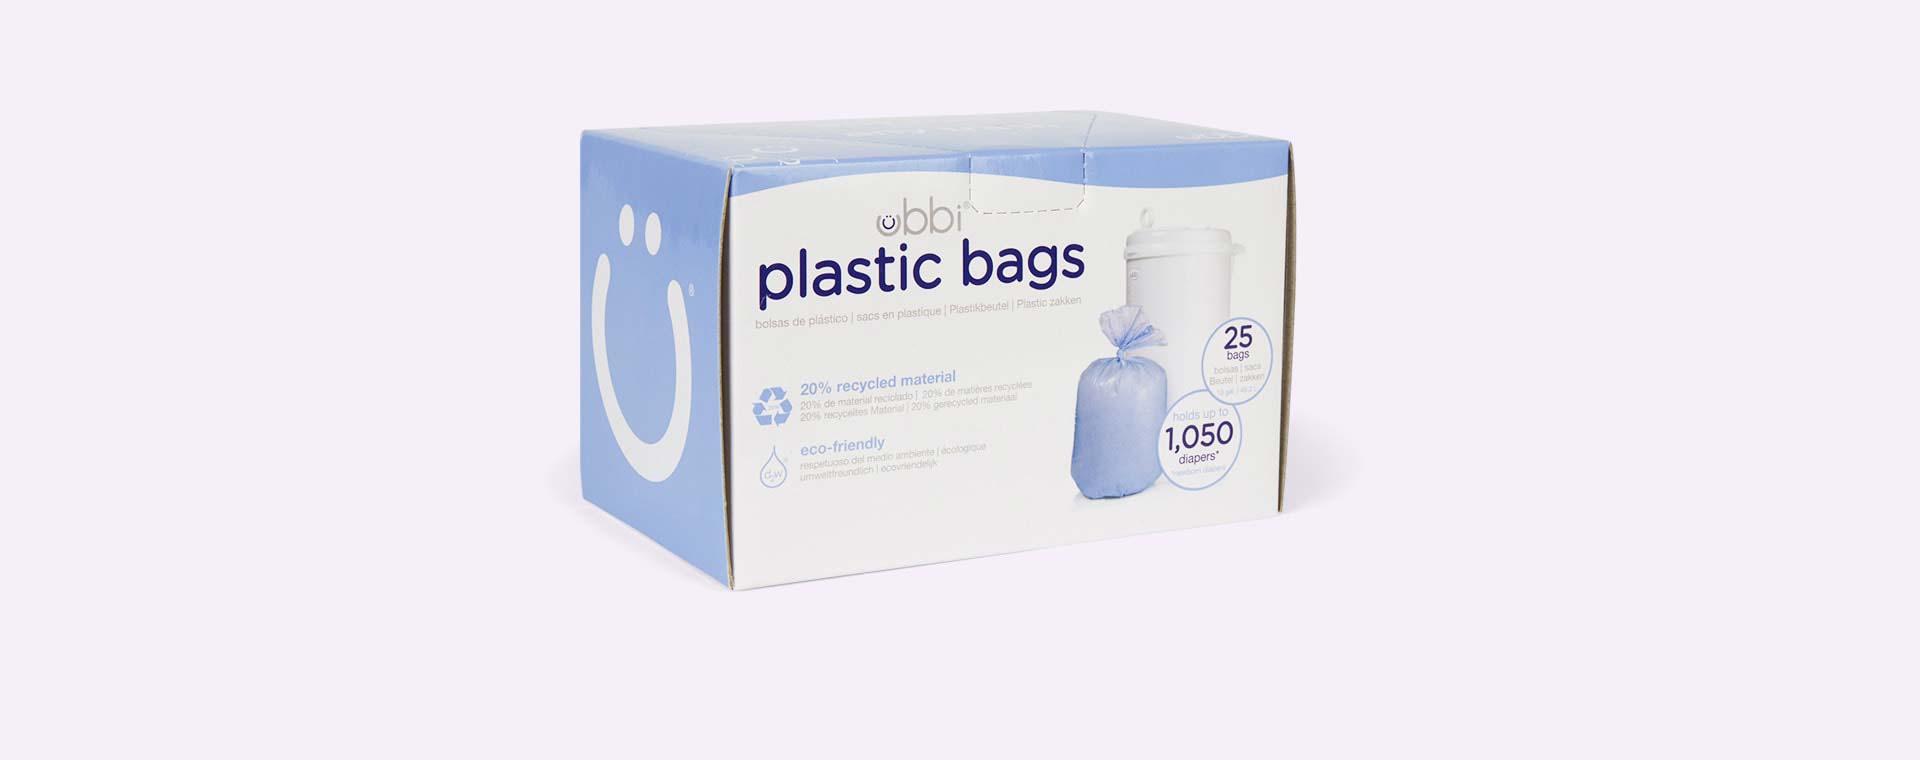 Purple ubbi Nappy Plastic Bags